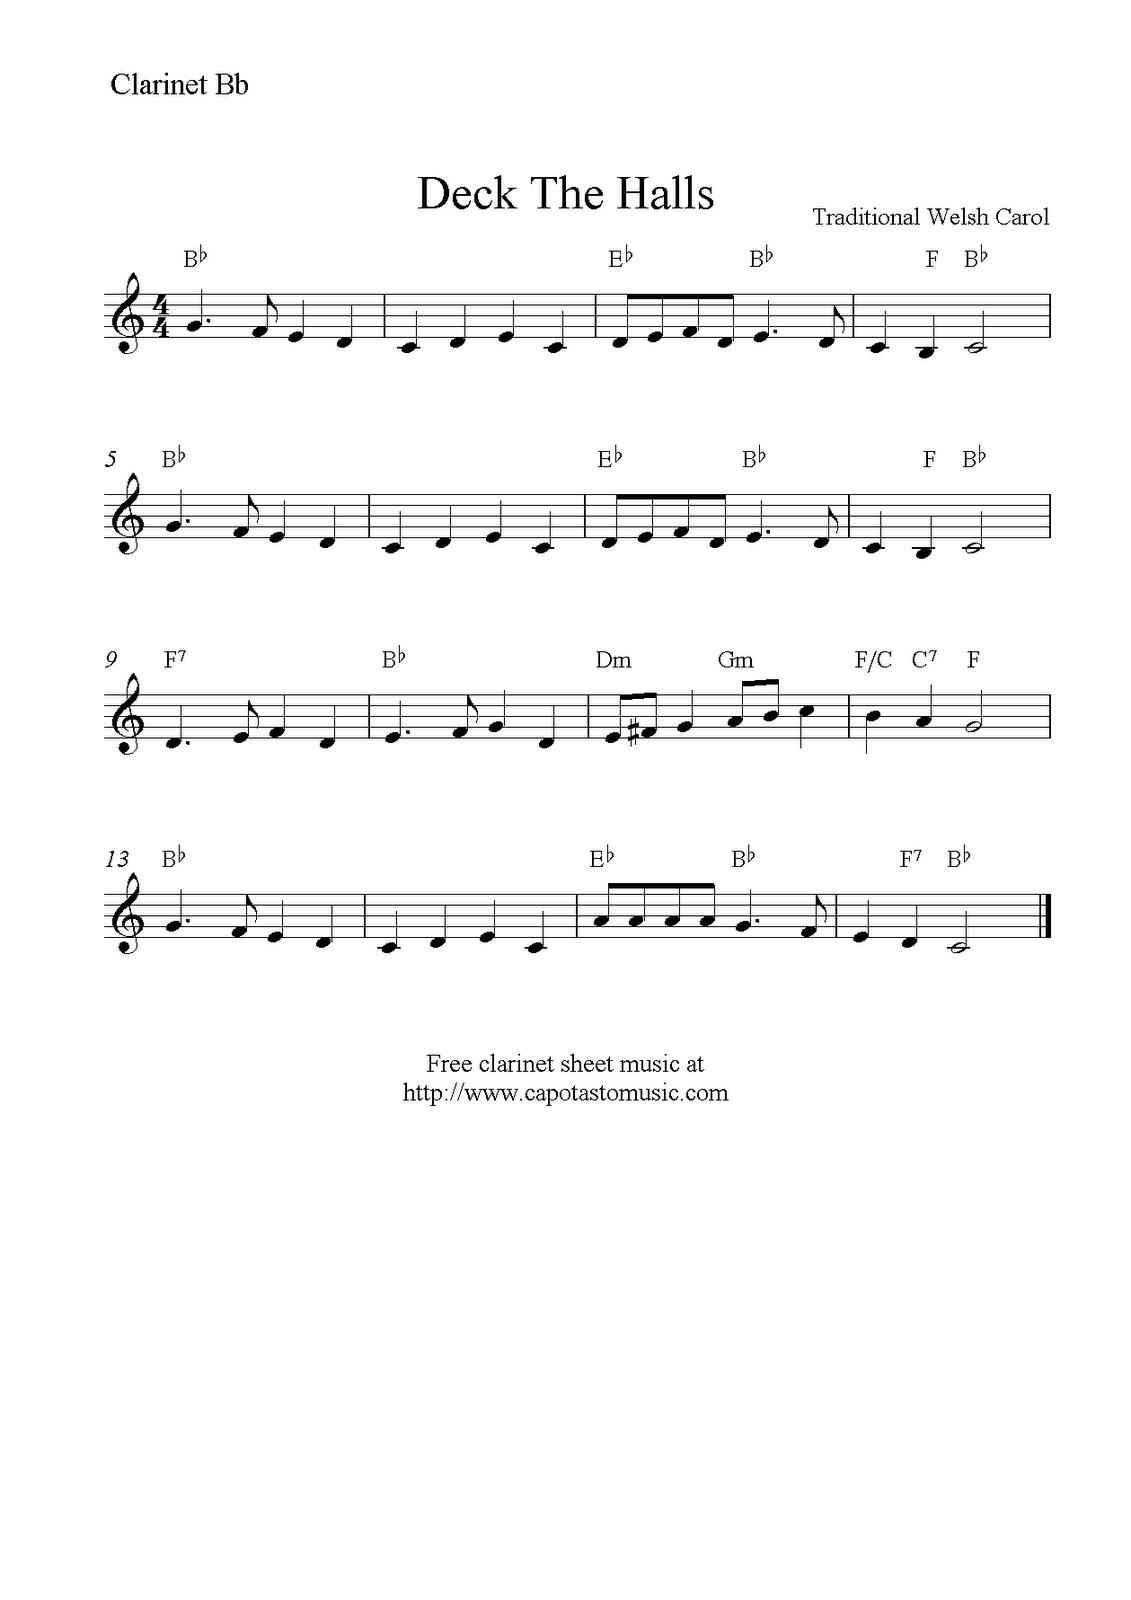 Christmas Clarinet Sheet Music Free - Google Search   Music - Free Printable Clarinet Music